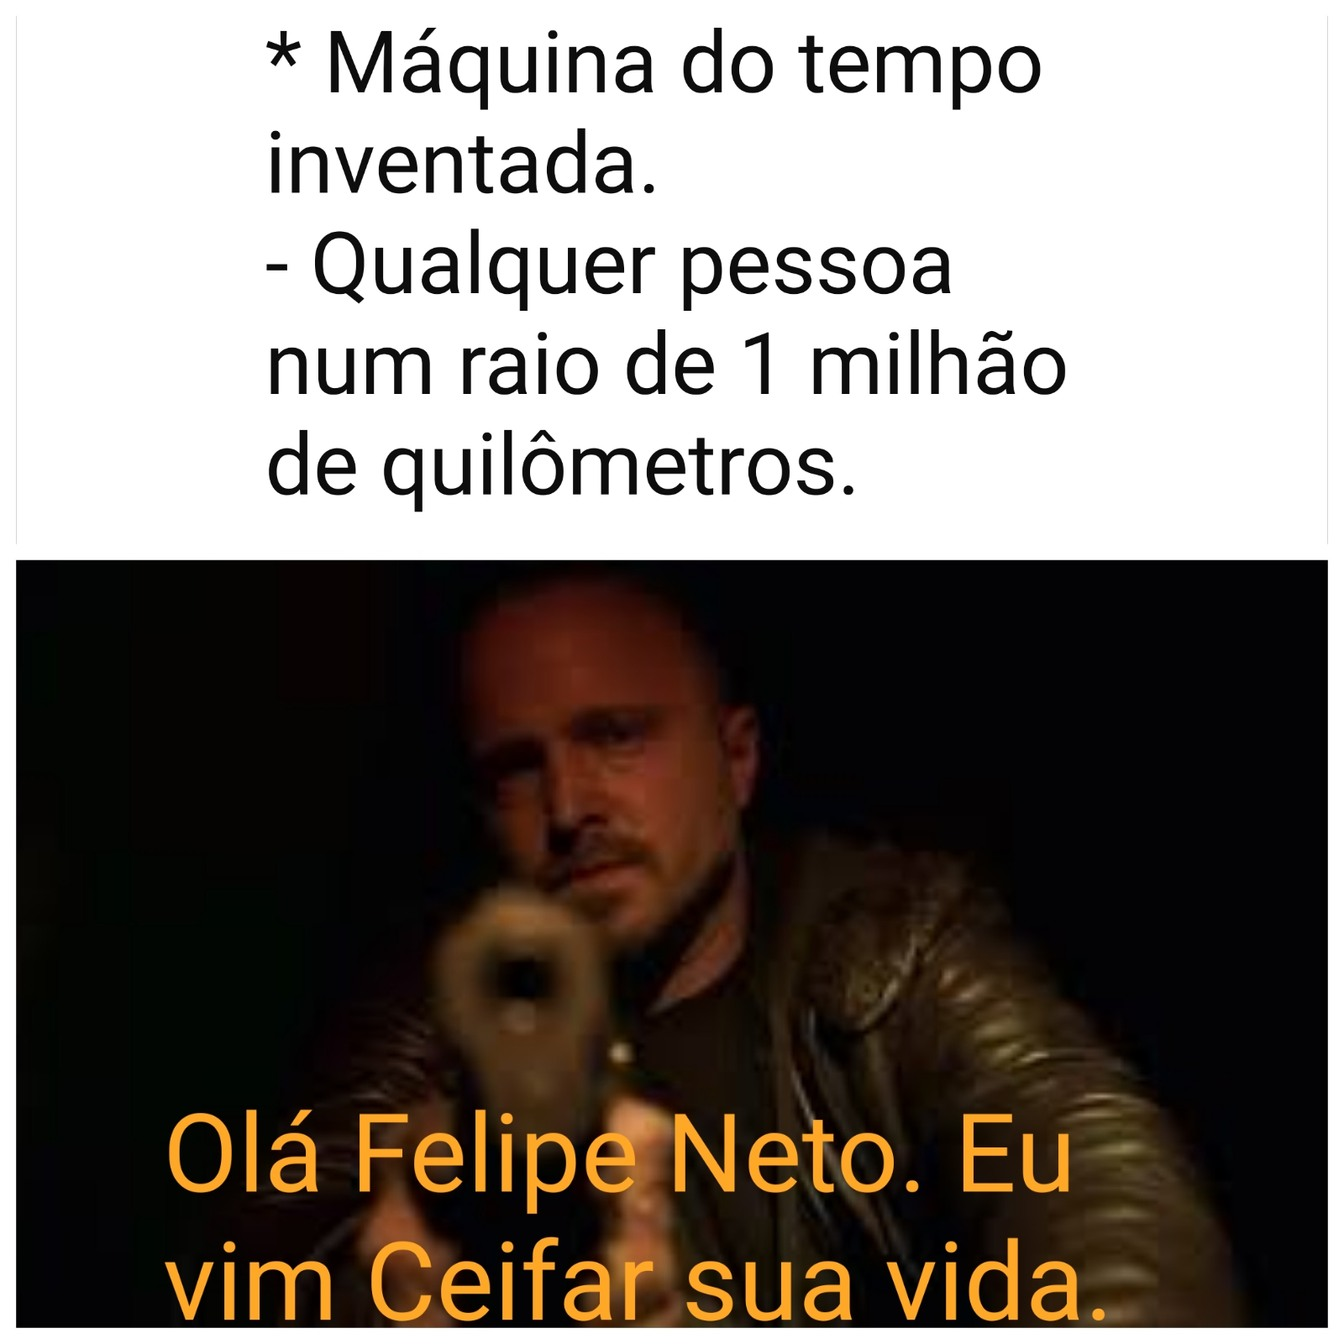 Felipe Neto - meme